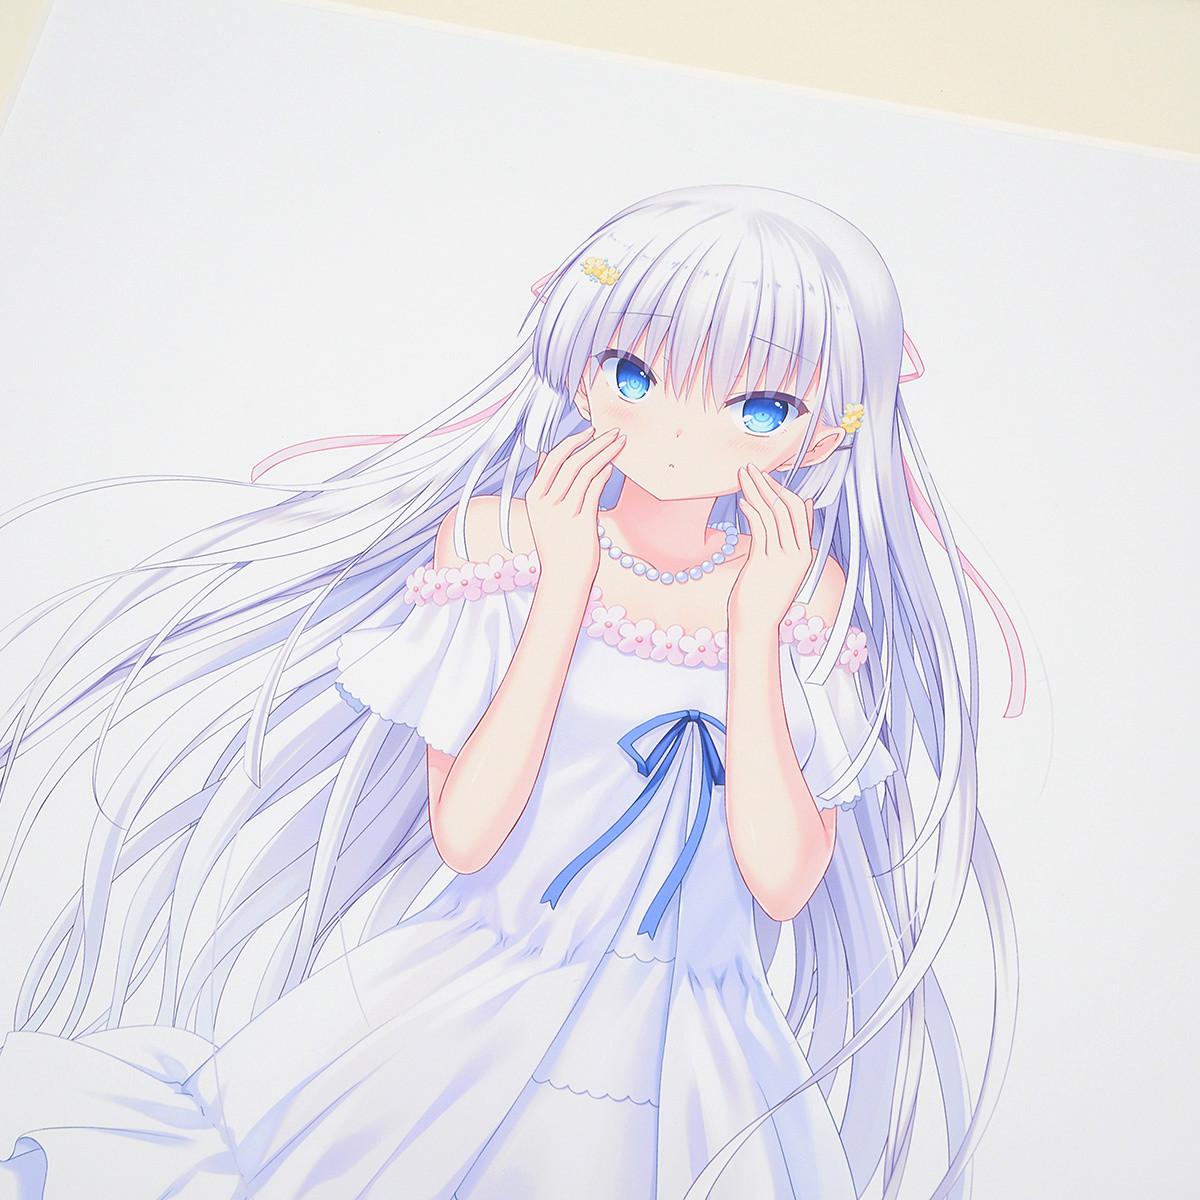 Key 20th Anniversary 描き下ろしイラスト複製原画 Summer pockets